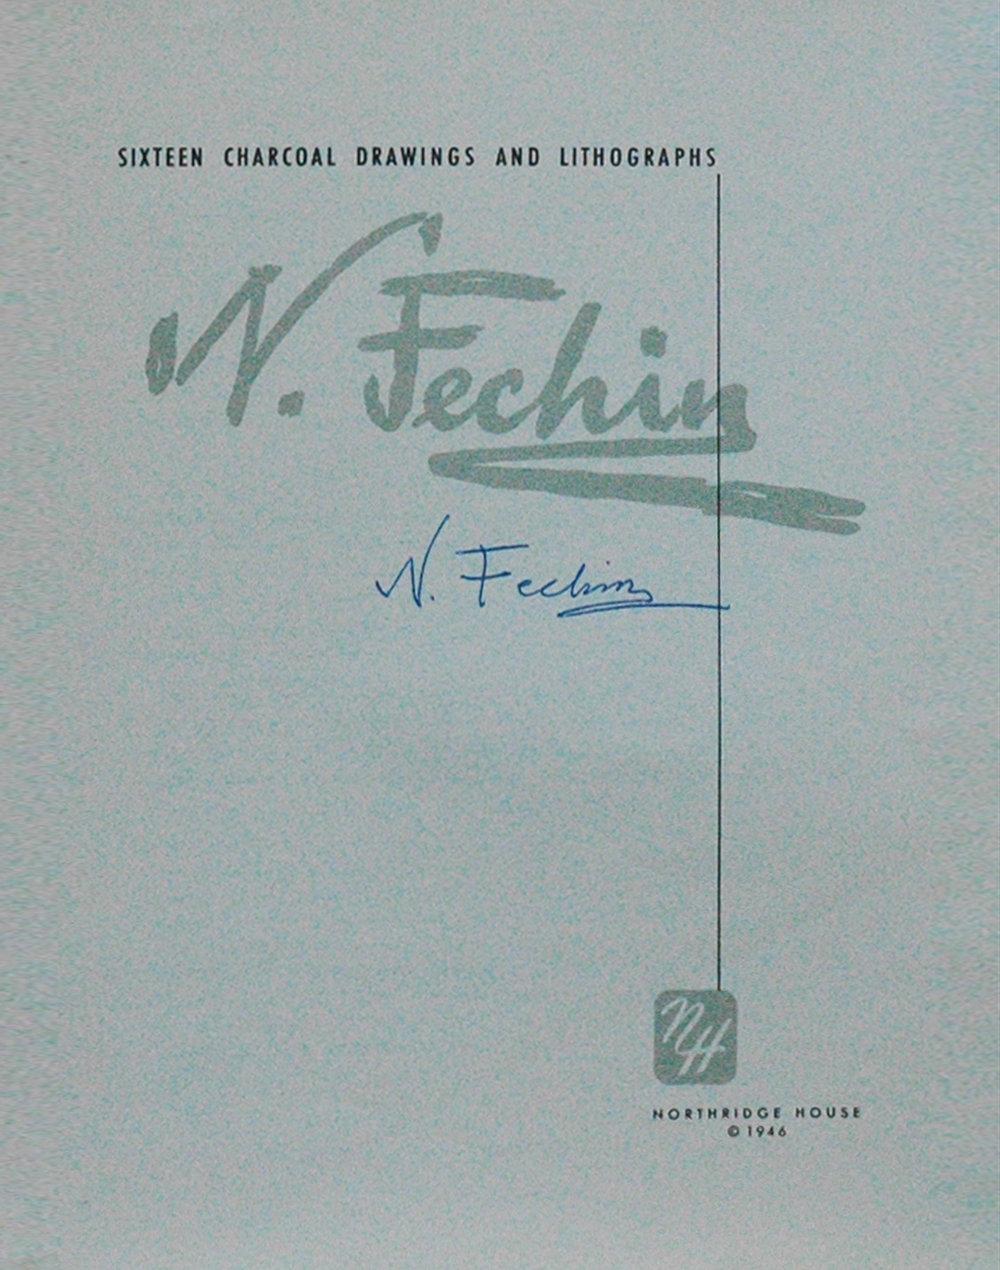 Portfolio insert signed by Nicolai Fechin